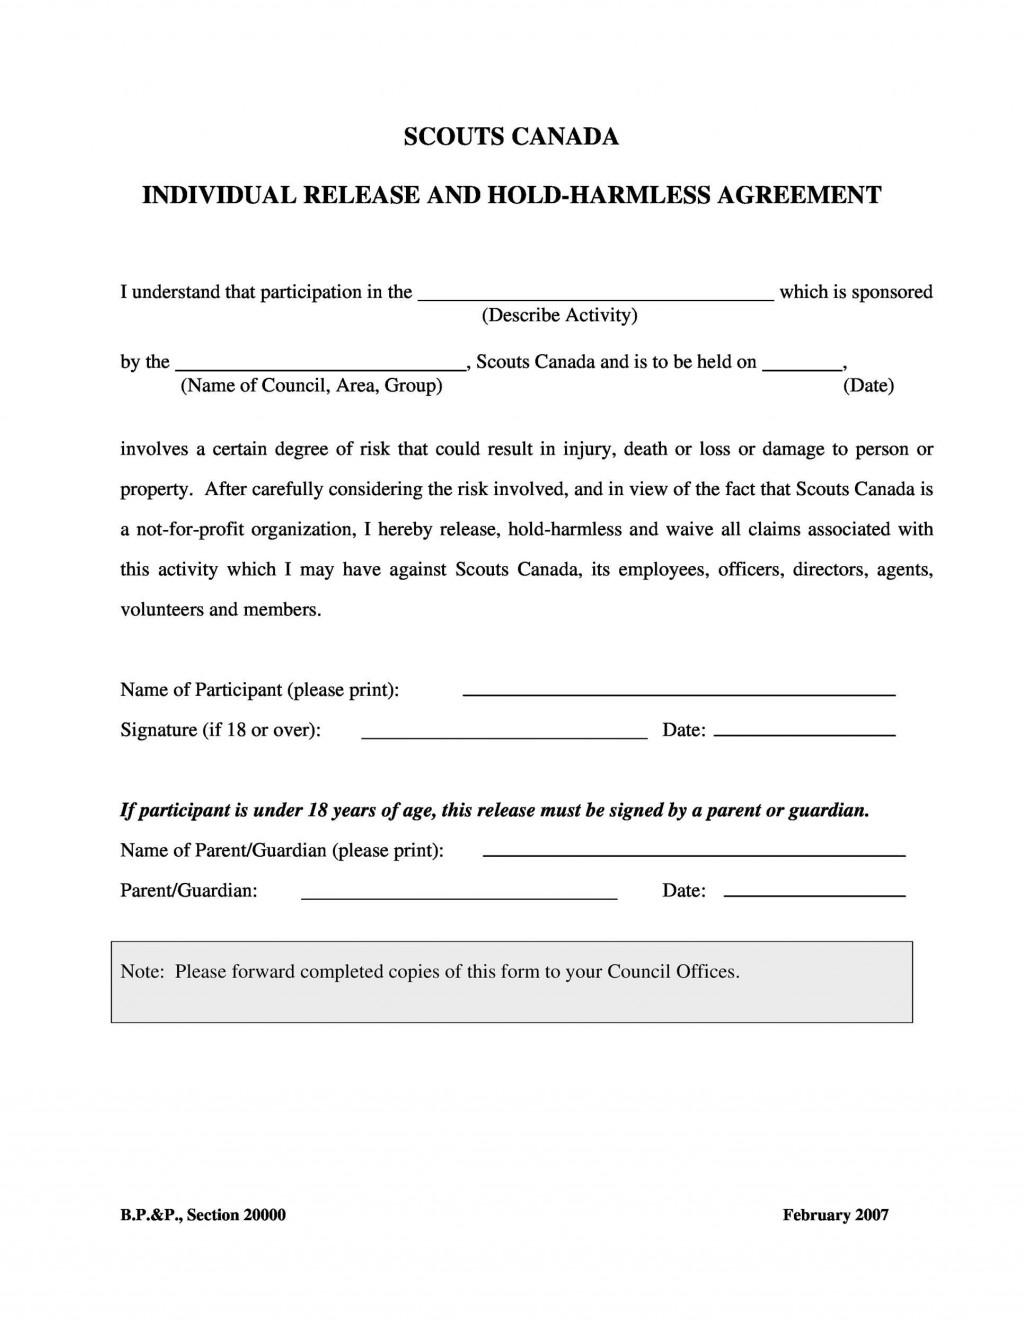 004 Unusual Hold Harmles Agreement Template Idea  Canada Word Free DownloadLarge